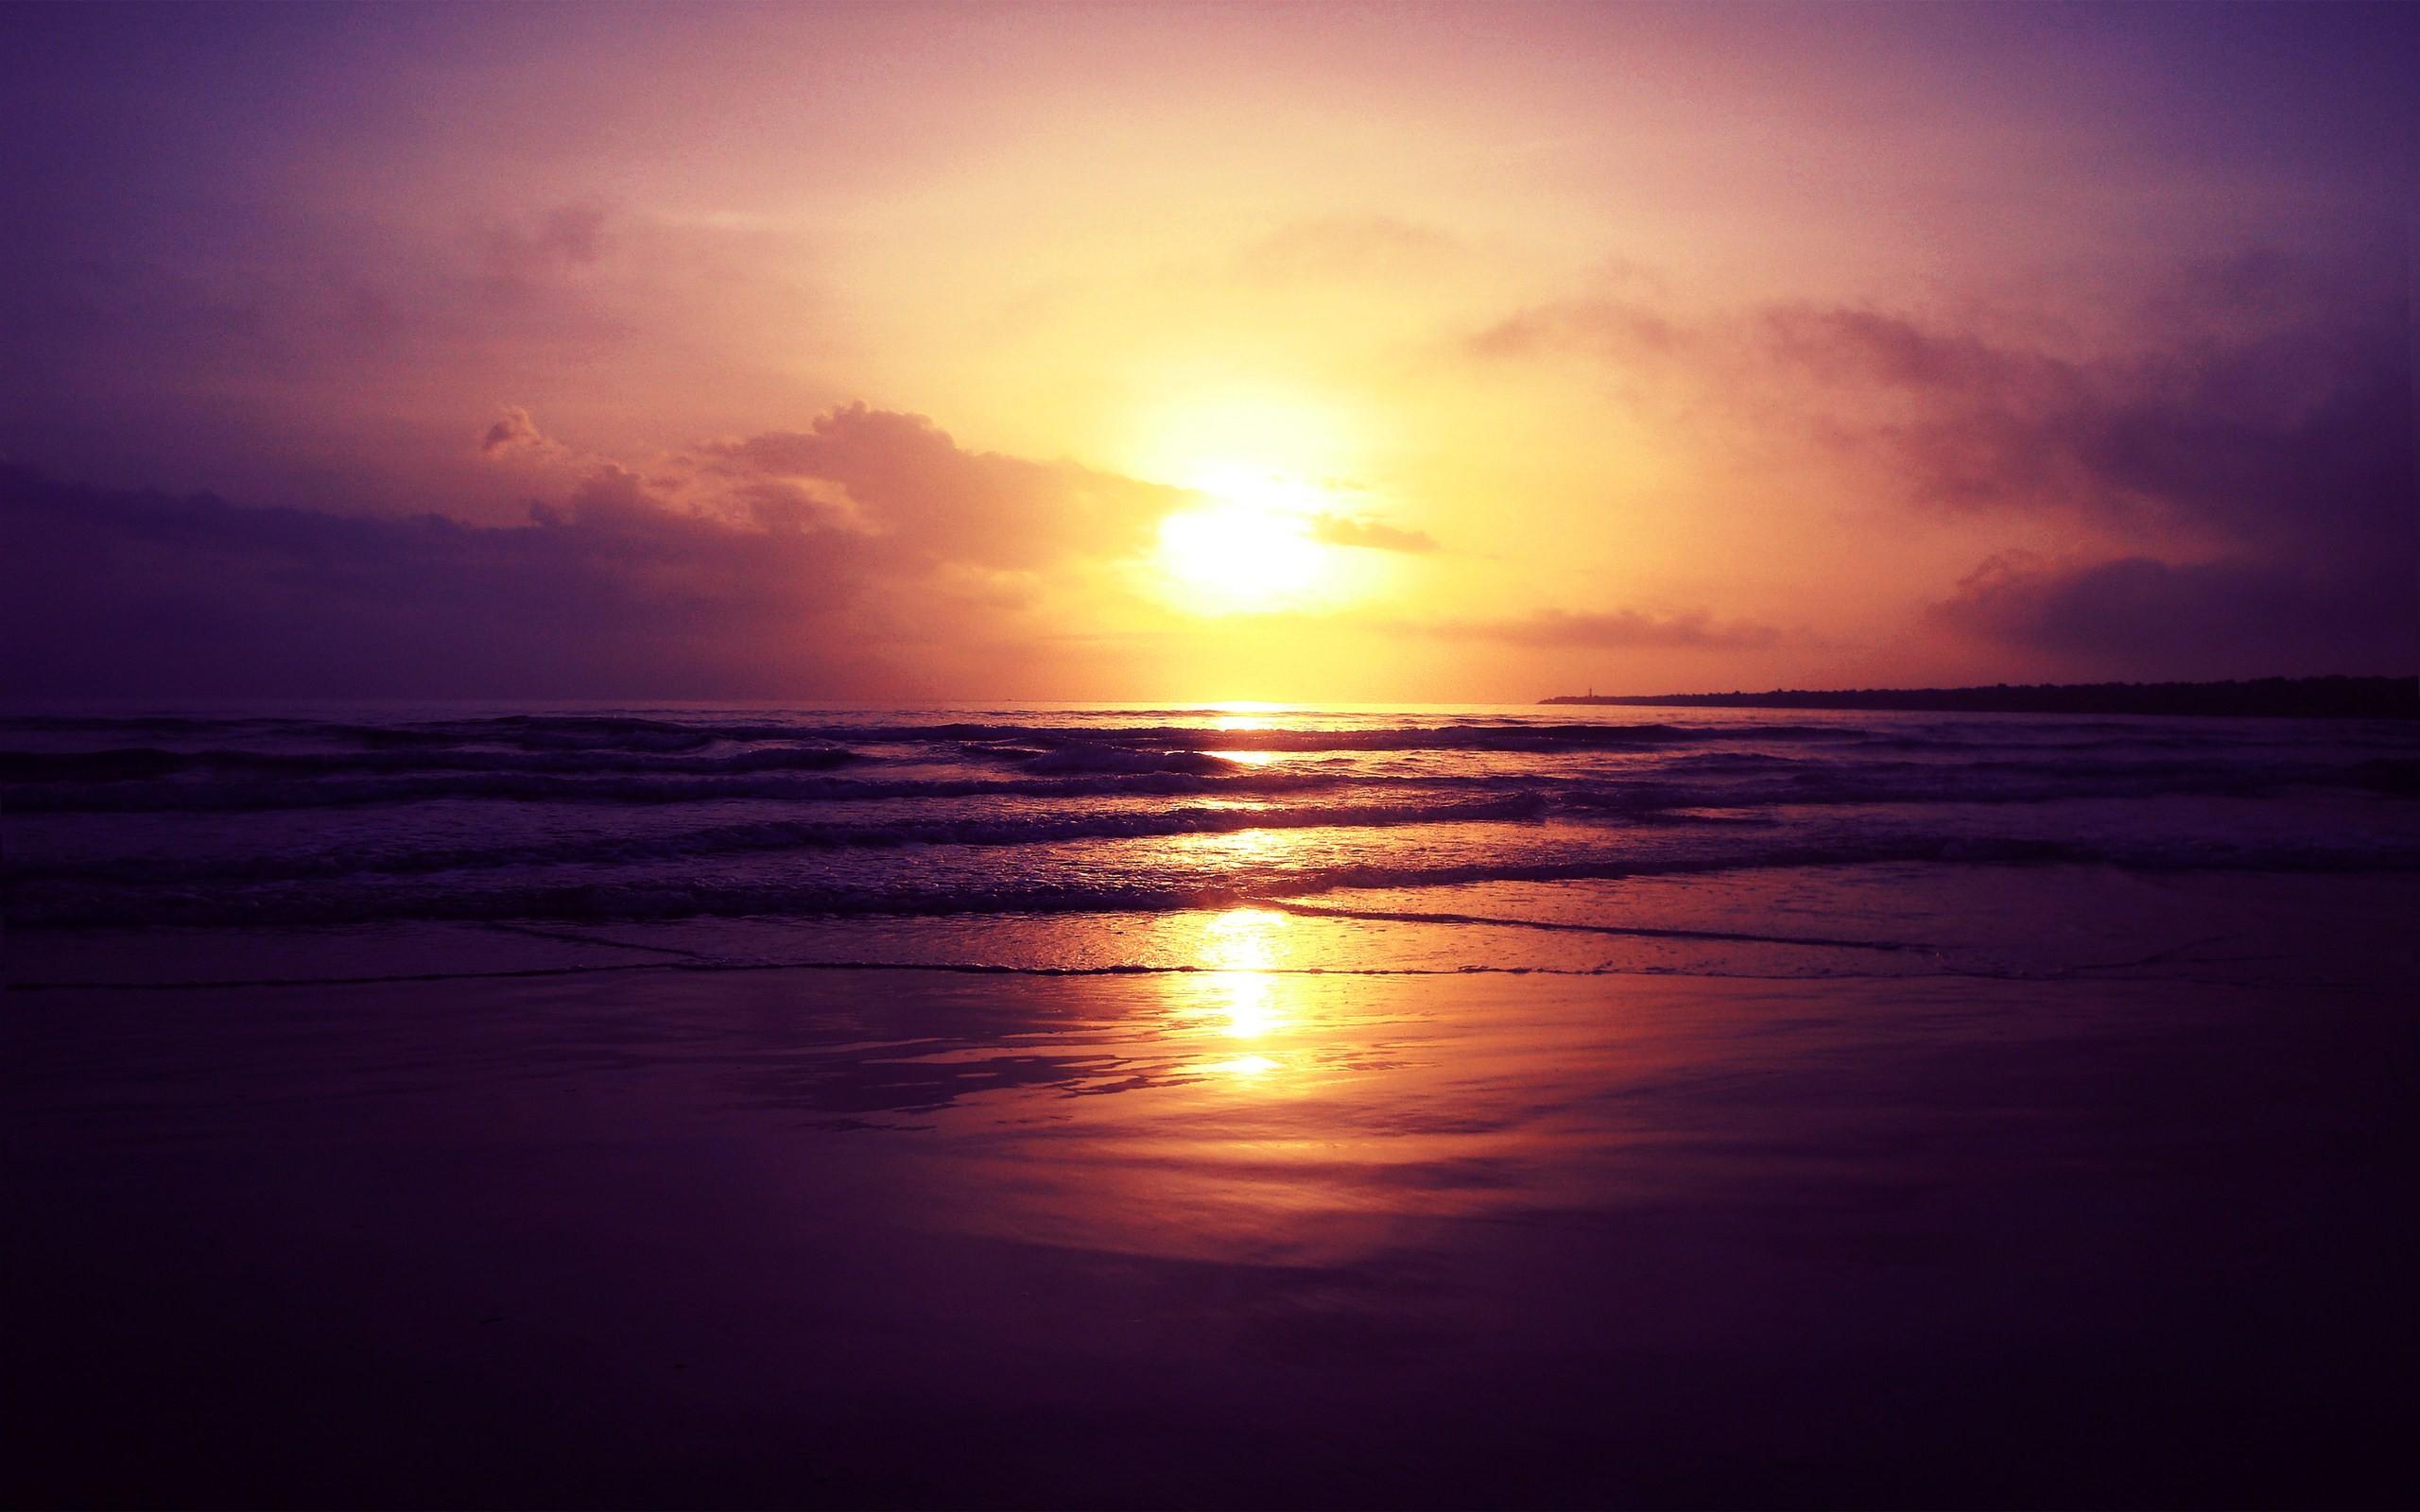 Beautiful Sunset Wallpapers HD Free for Desktop